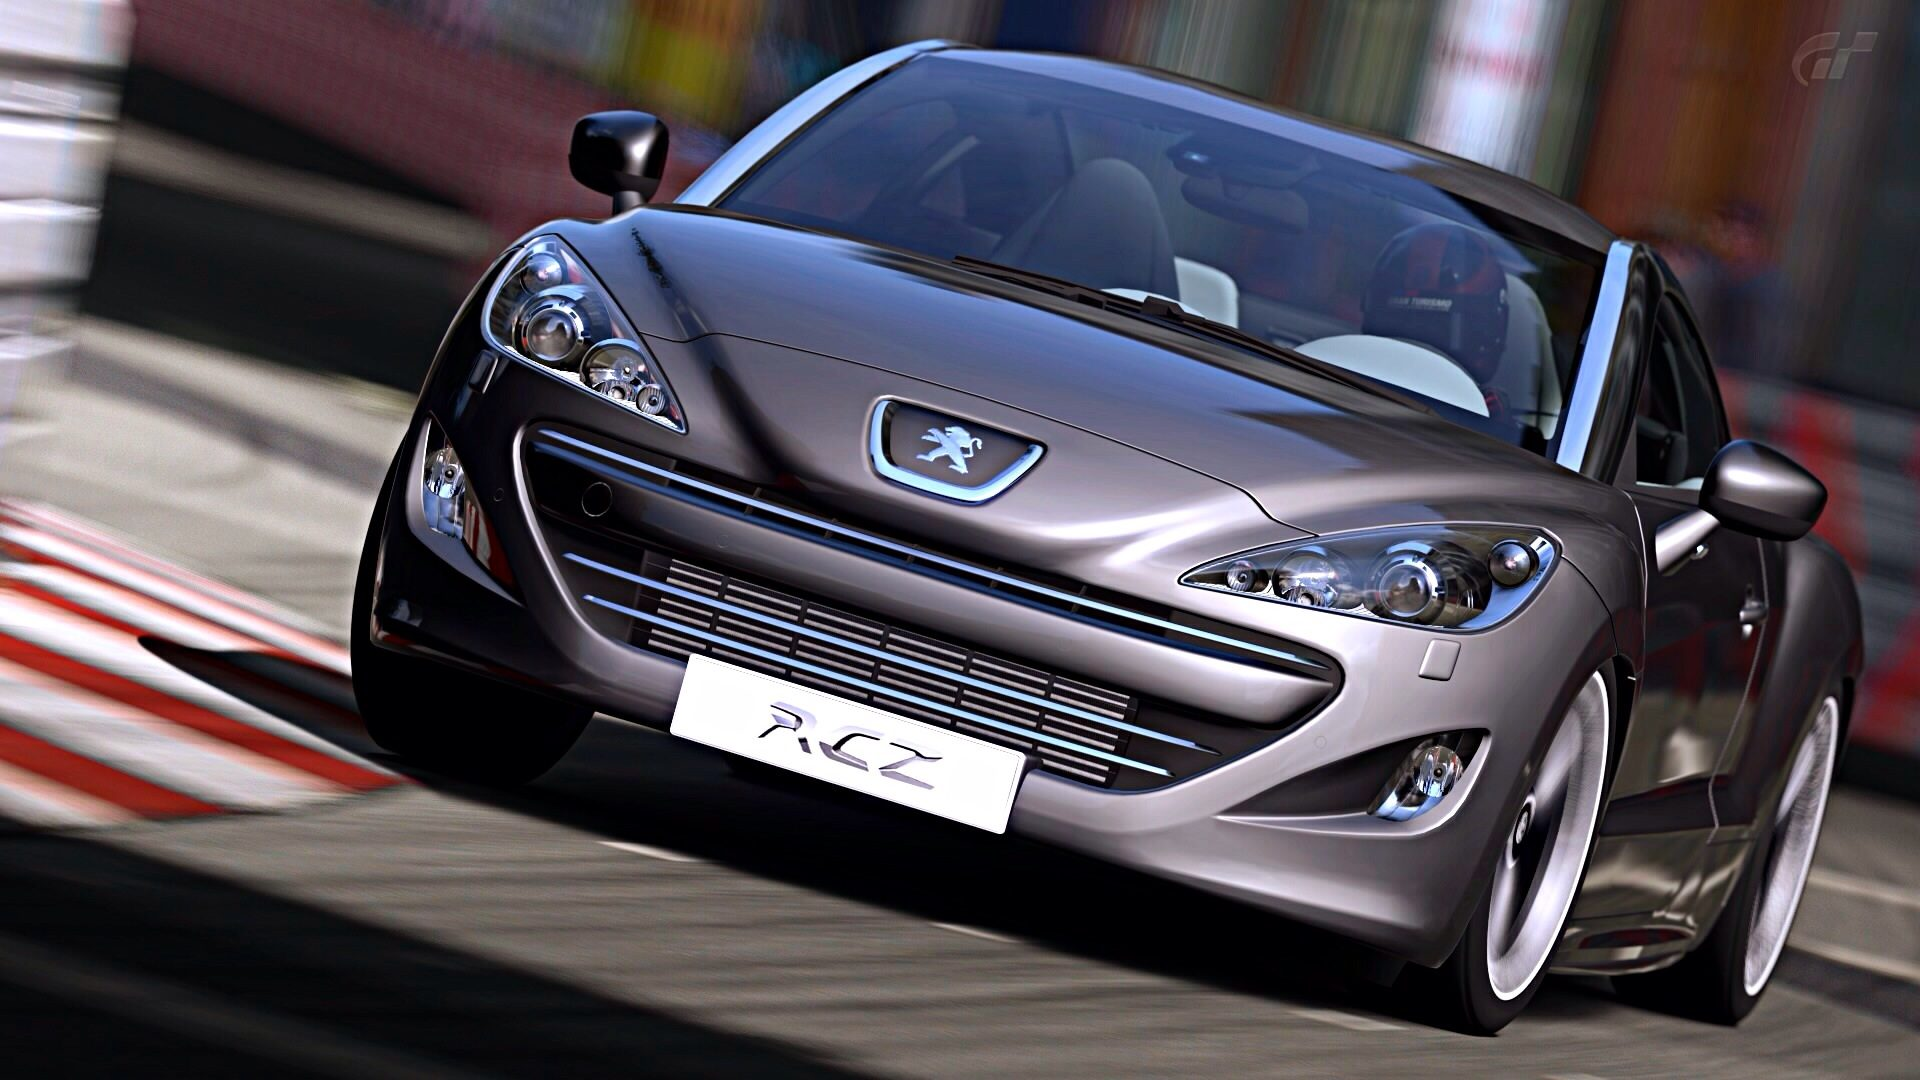 Peugeot RCZ London (1).jpg